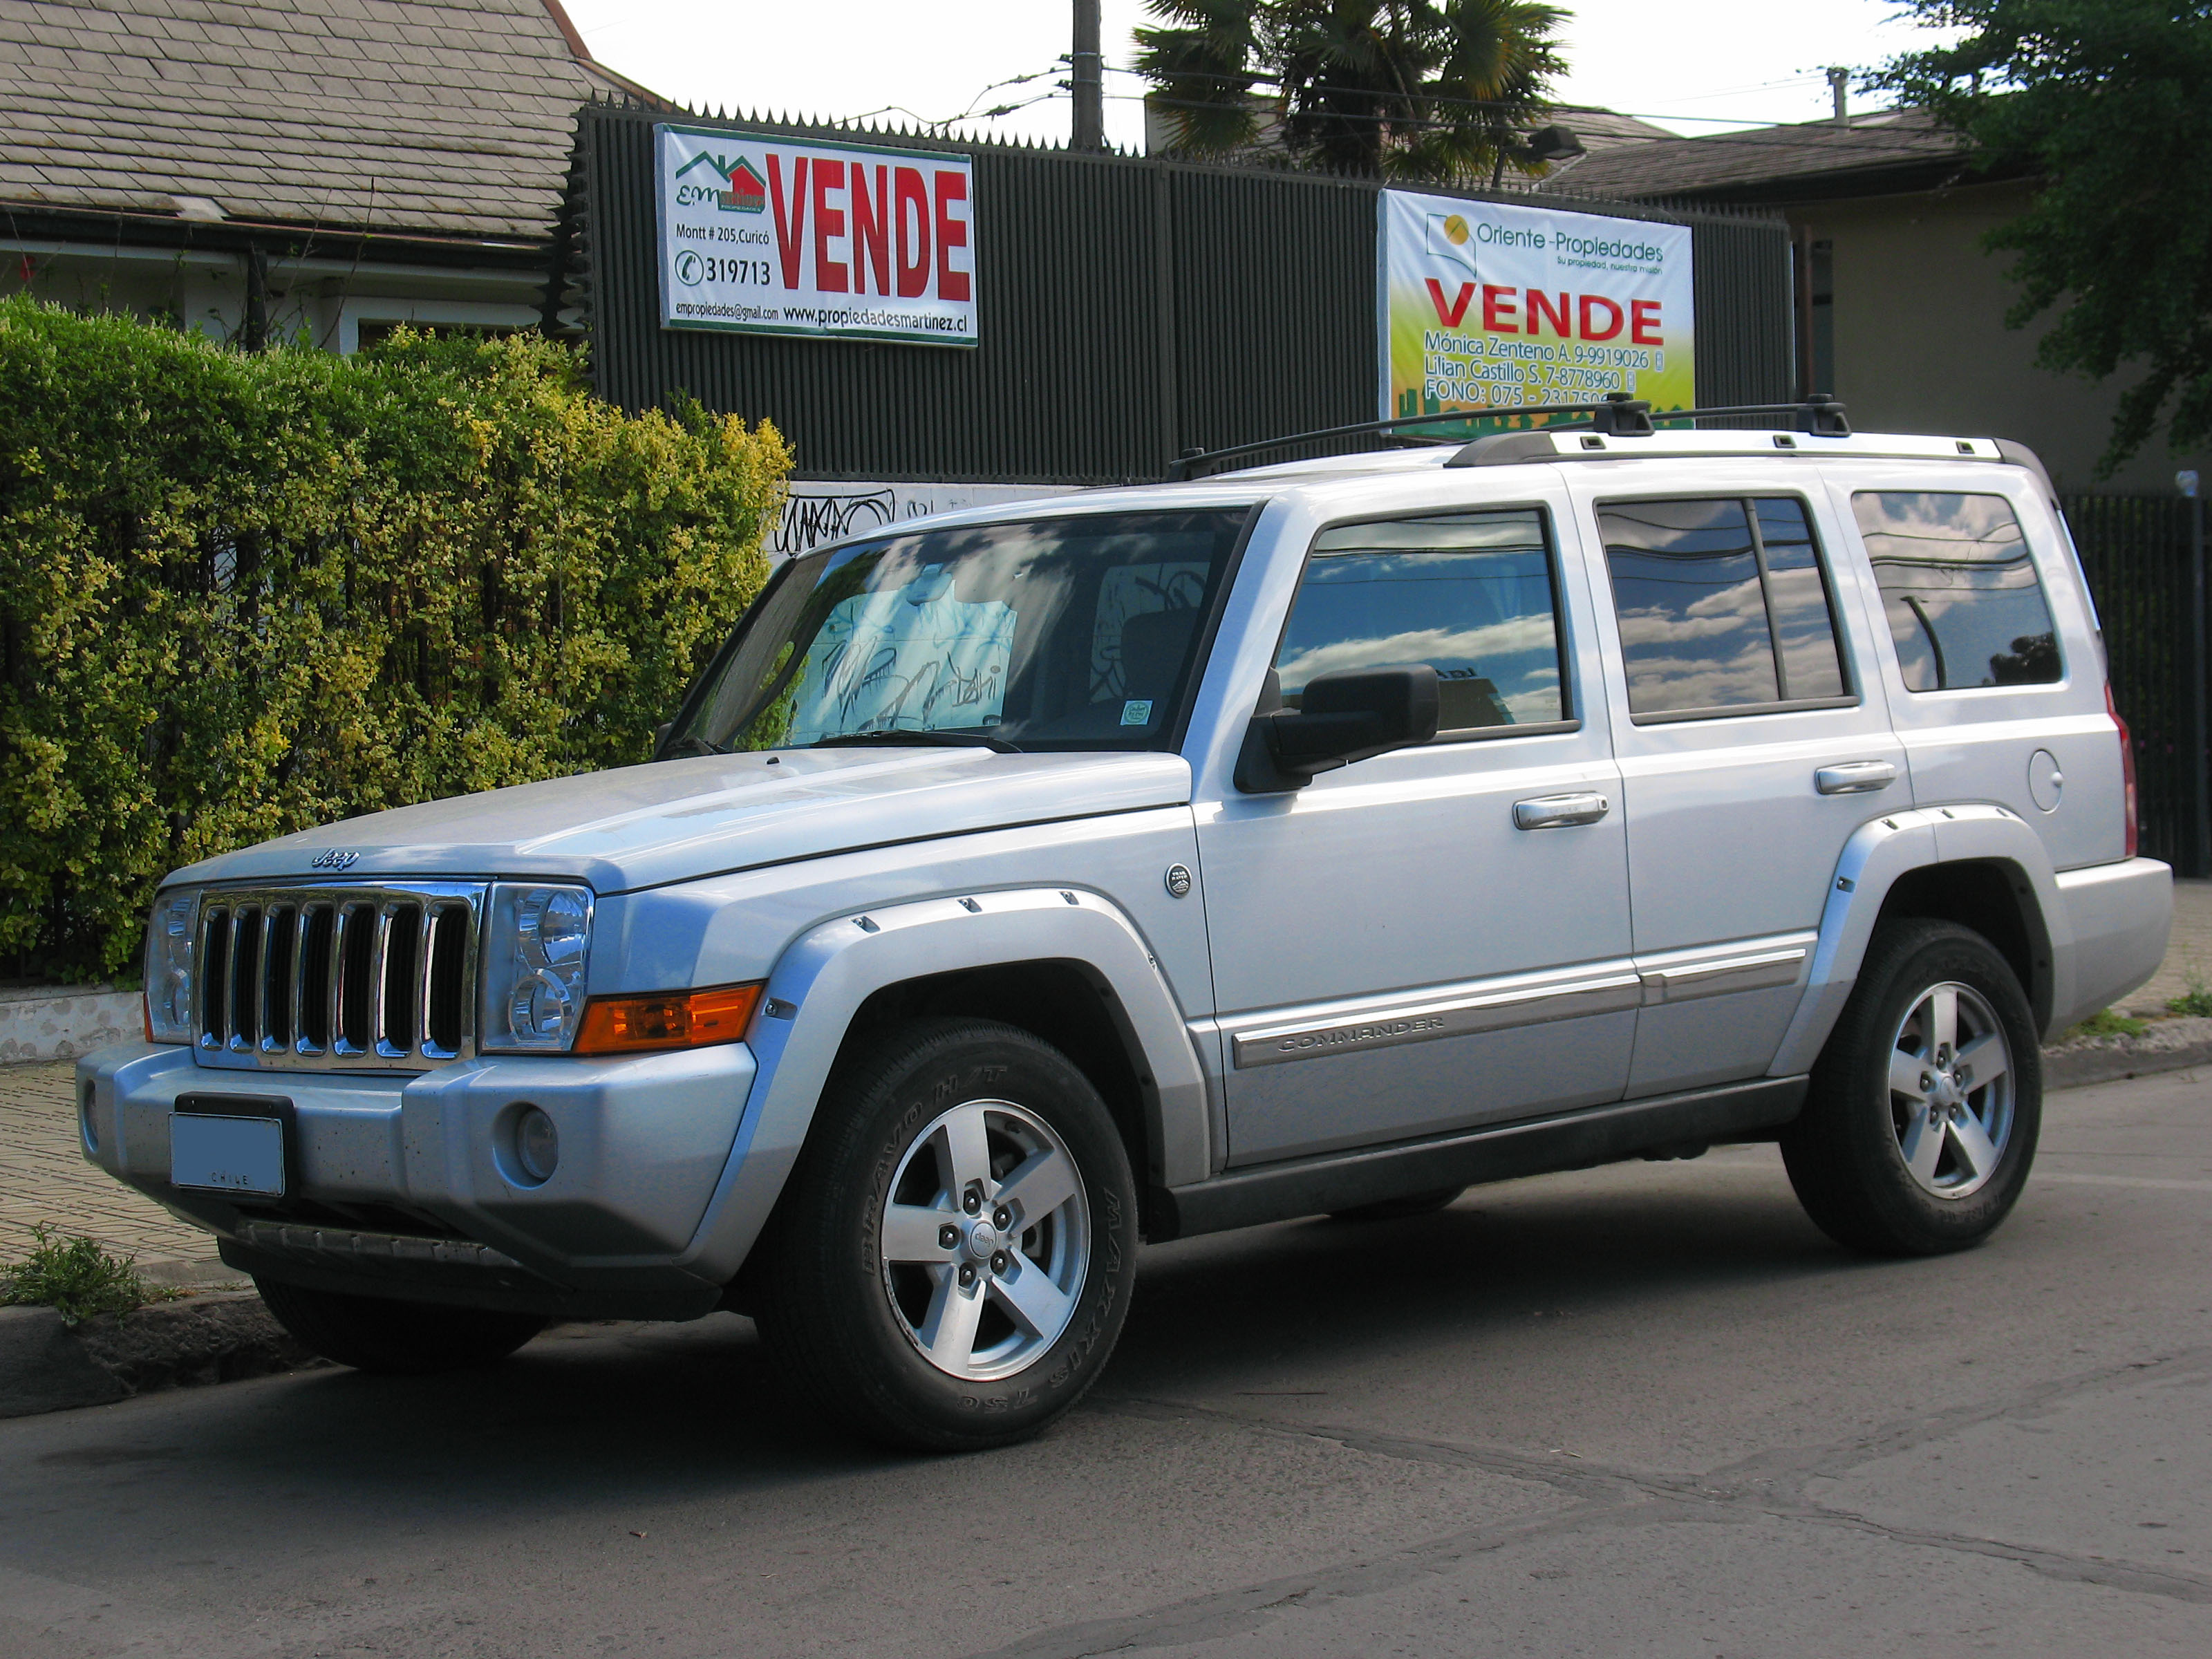 file:jeep commander 4.7l limited 2007 (15611627438)